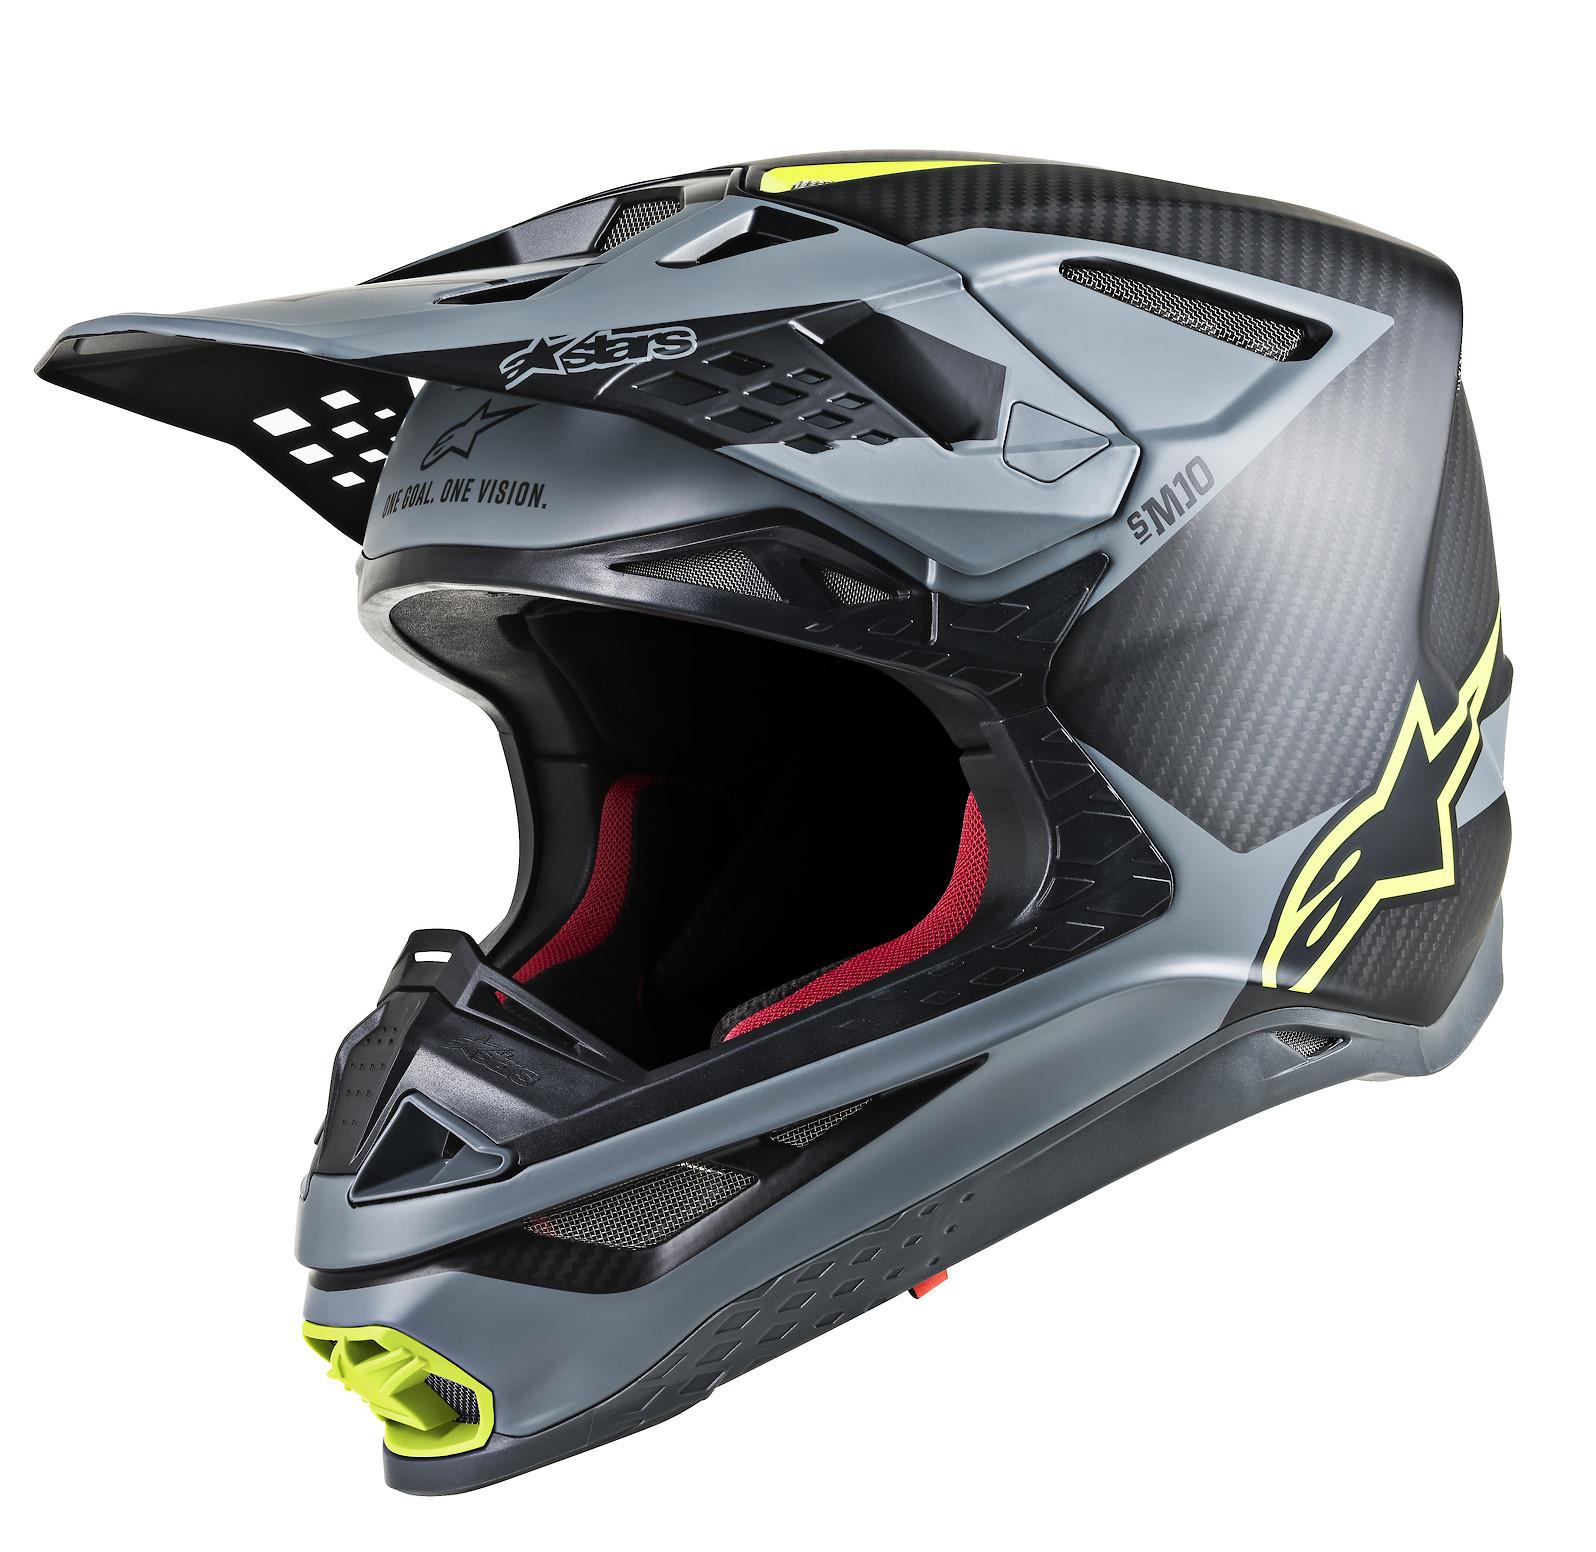 8300219-175-fr_supertech-s-m10-meta-helmet